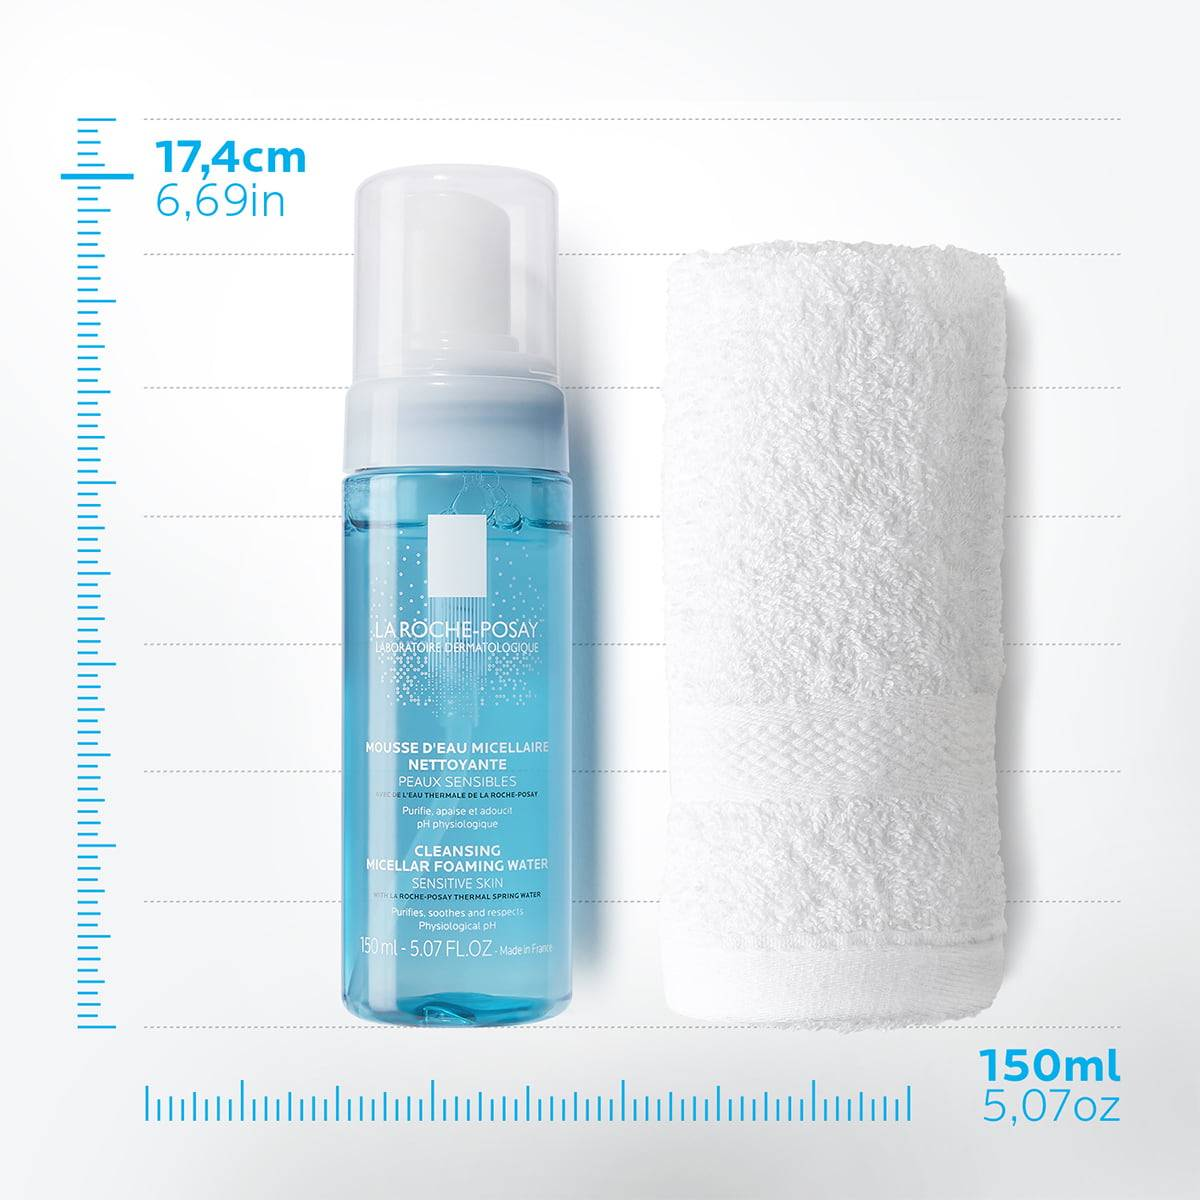 La Roche Posay ProduktSide Ansiktsrens Physiological Foaming Water 1